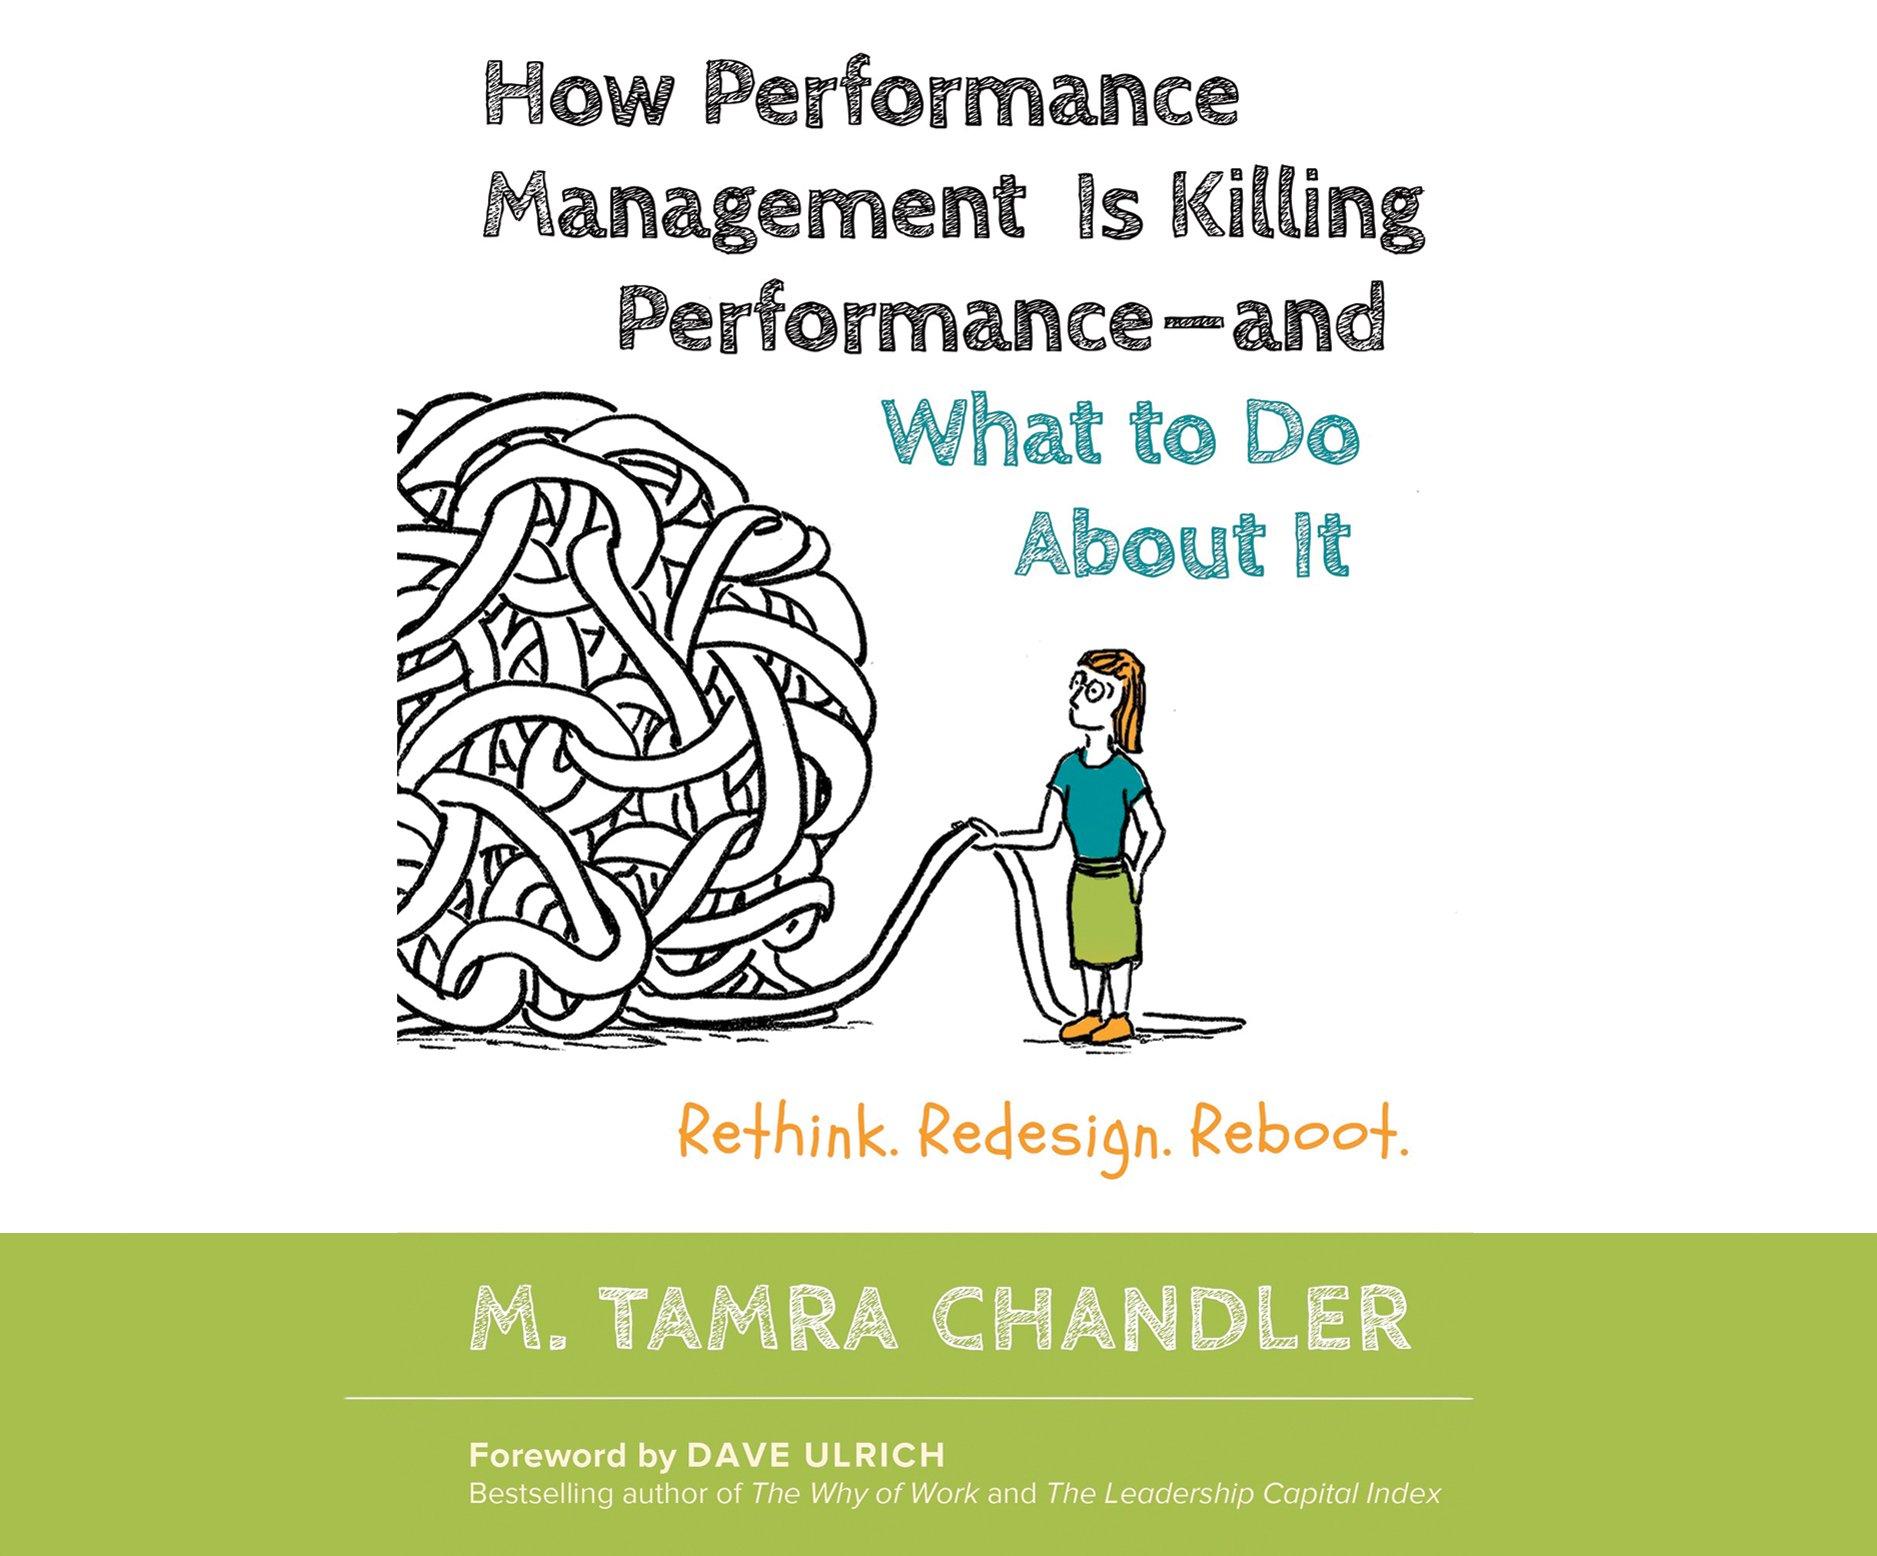 How performance management is killing performance and what to do how performance management is killing performance and what to do about it m tamra chandler natalie hoyt 9781520003320 amazon books fandeluxe Choice Image